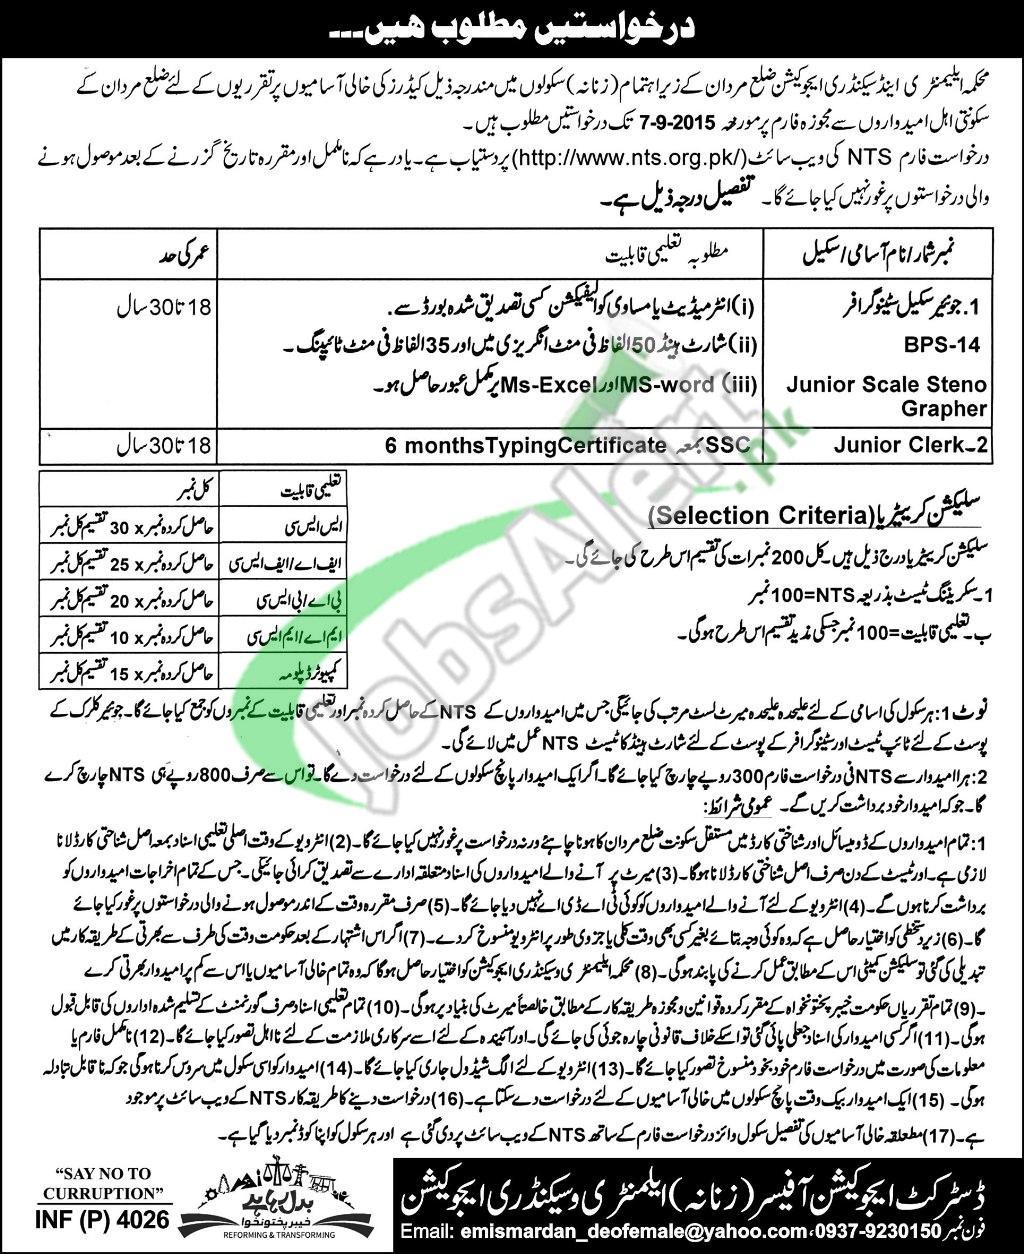 KPK Elementary & Secondary Education Mardan Jobs